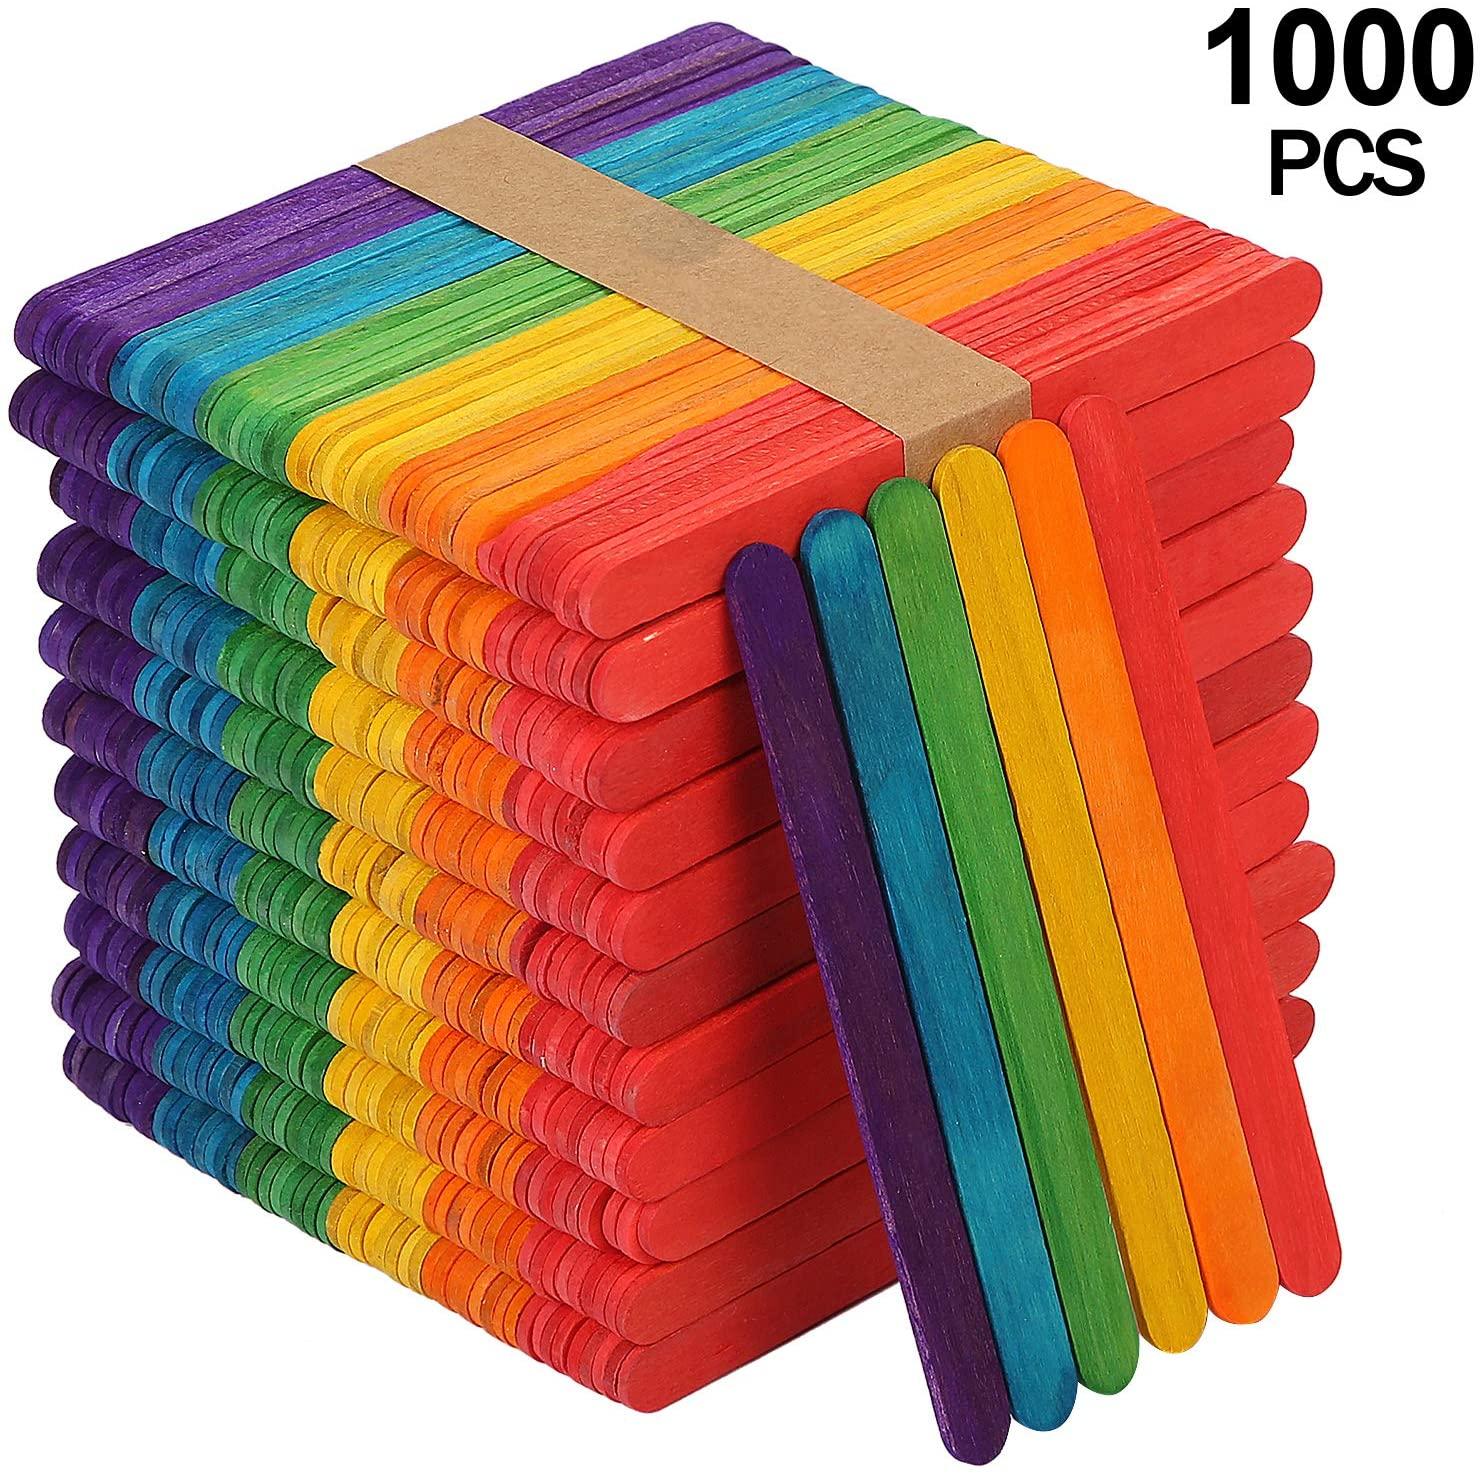 KEILEOHO 1000 PCS Colored Popsicle Sticks, Natural Lollipop Sticks Jumbo Wooden Lolly Sticks for Craft Homemade DIY Model Making Design Kids Education Adults Toys